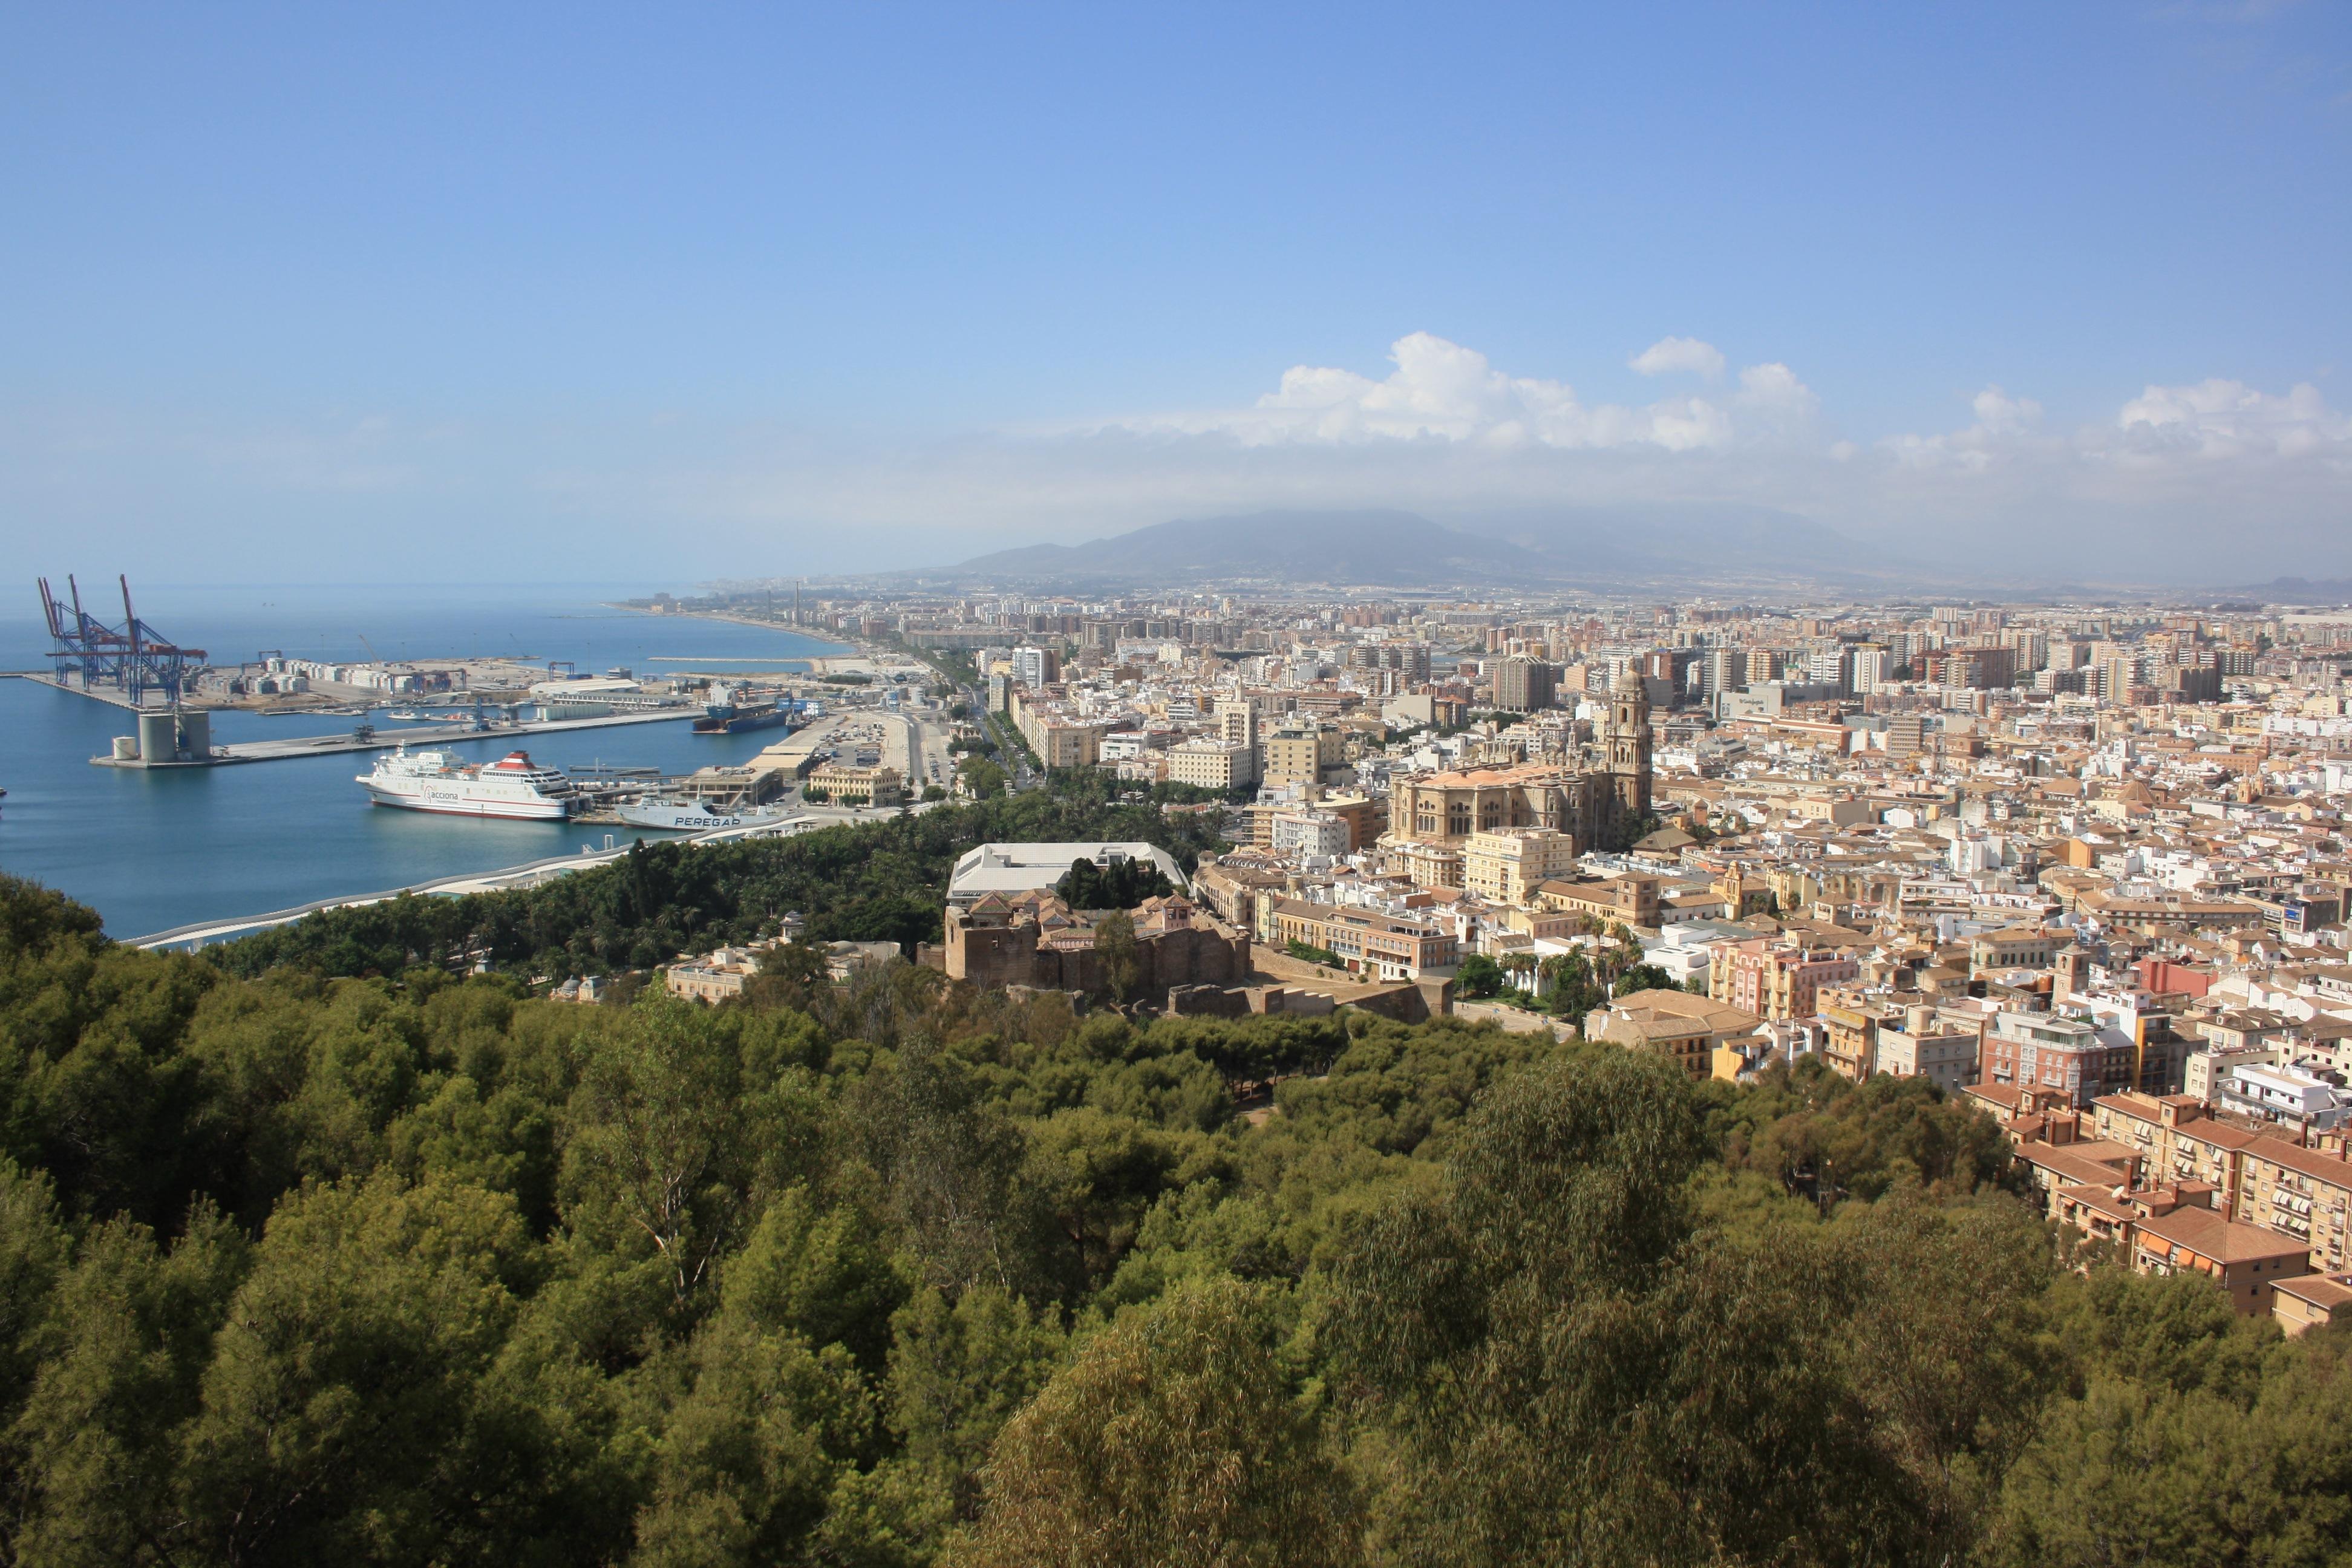 Archivo:View of Malaga 2.jpg - Wikipedia, la enciclopedia libre